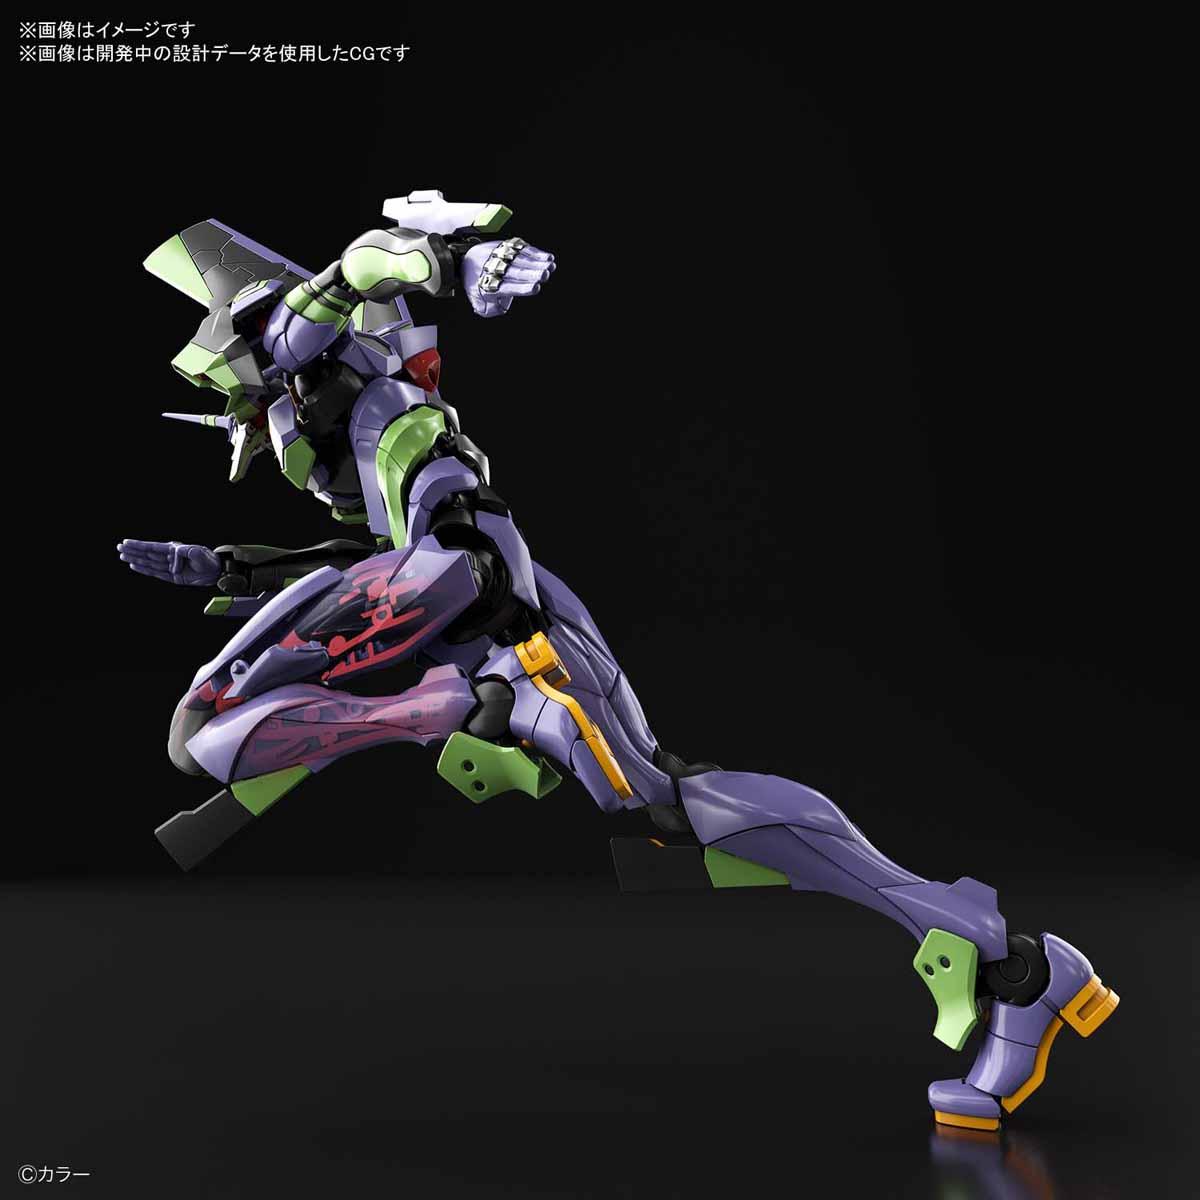 RG『汎用ヒト型決戦兵器 人造人間エヴァンゲリオン初号機』プラモデル-006